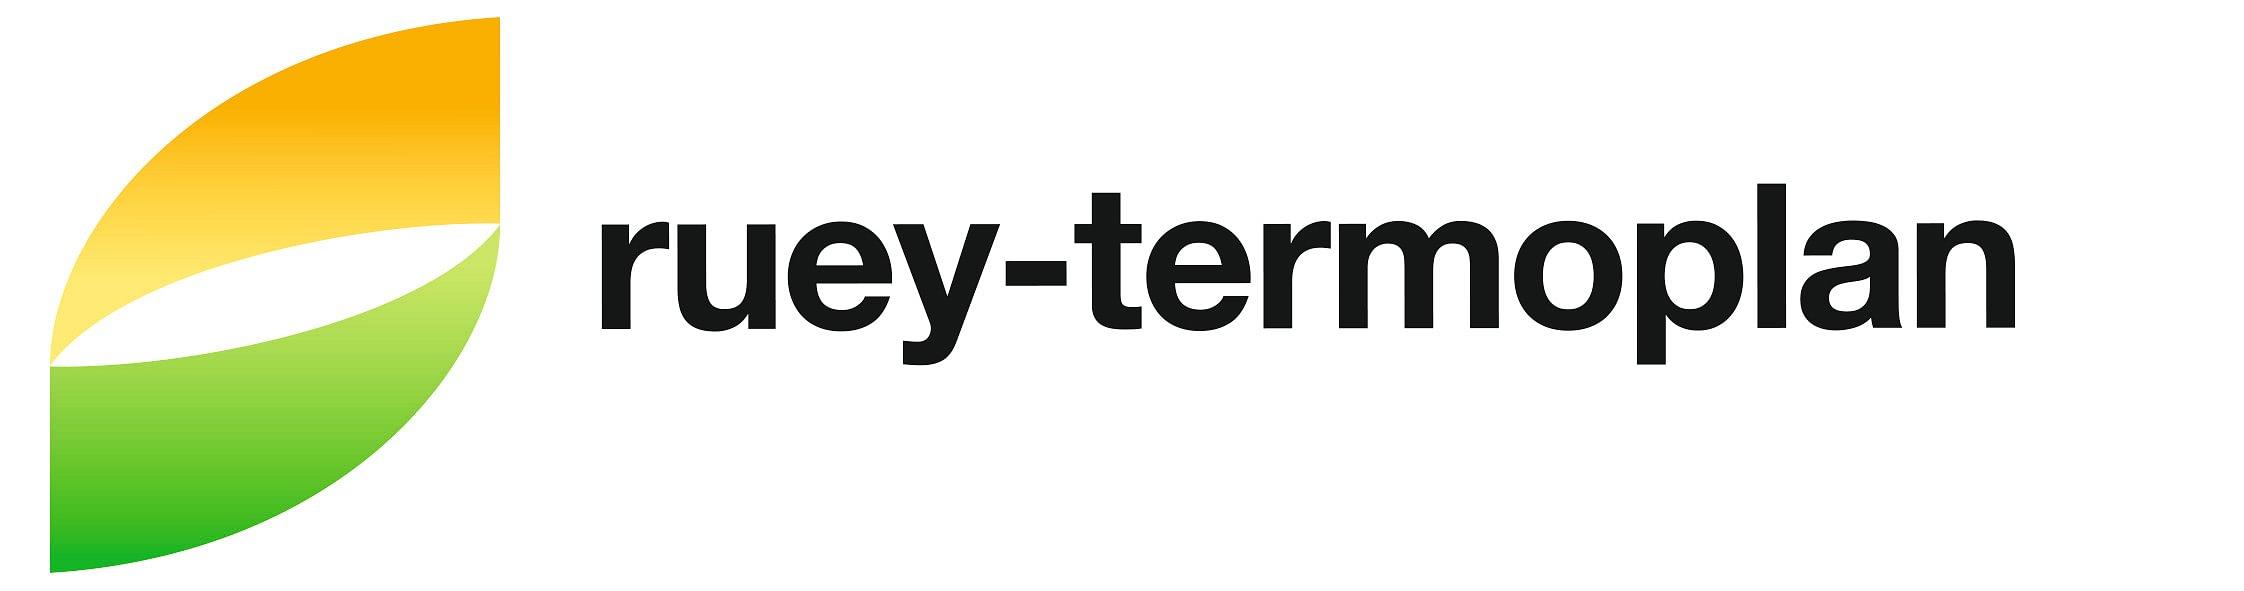 Ruey-Termoplan